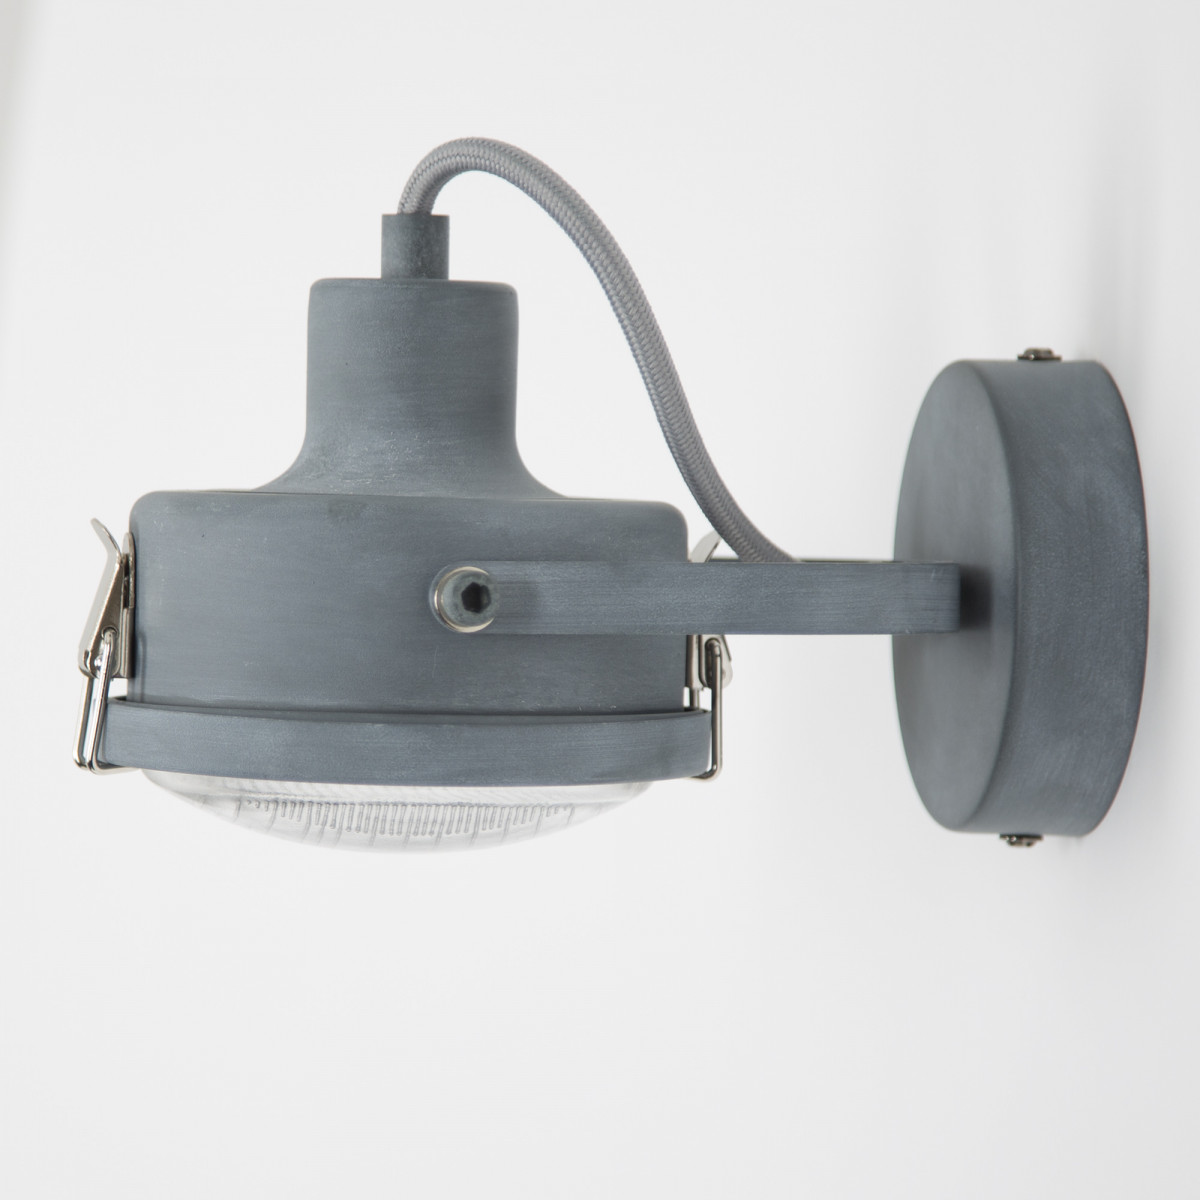 wandlampen industrieel - opbouwspot Satellite 1 grijs of zwart - industriele lamp - spots - Nostalux